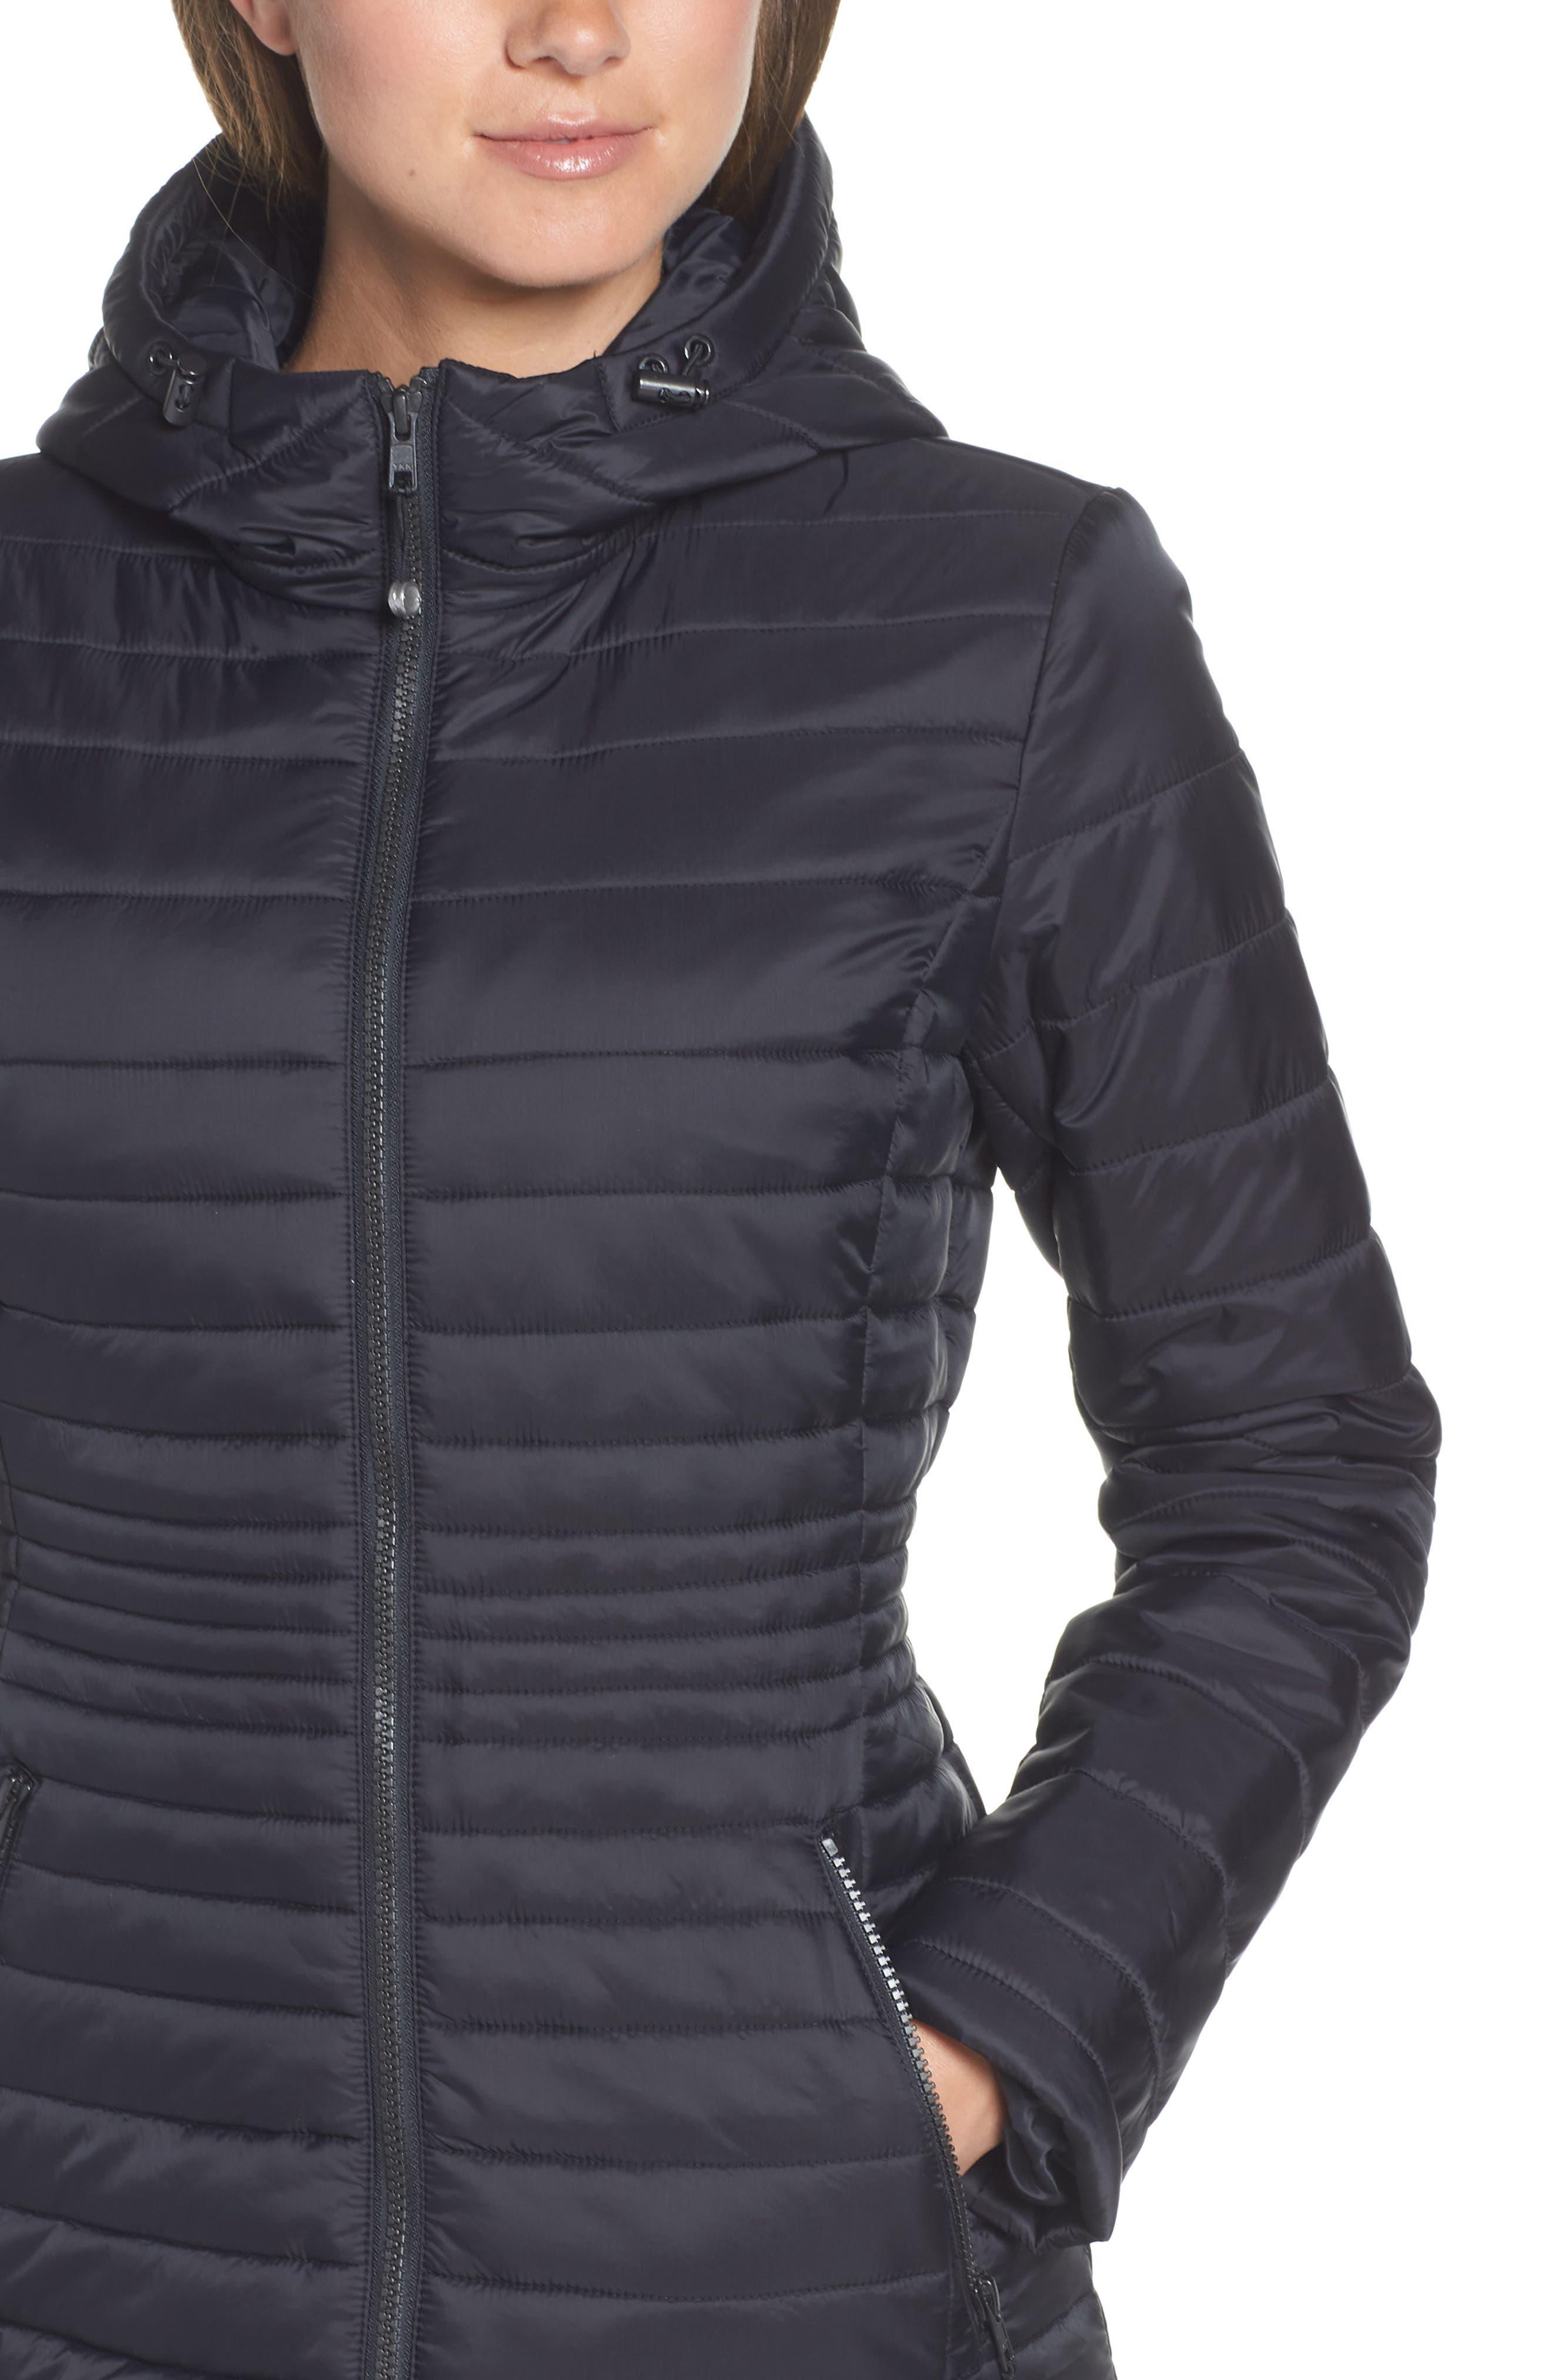 ZELLA, City Dweller Water Resistant Puffer Jacket, Alternate thumbnail 5, color, 001